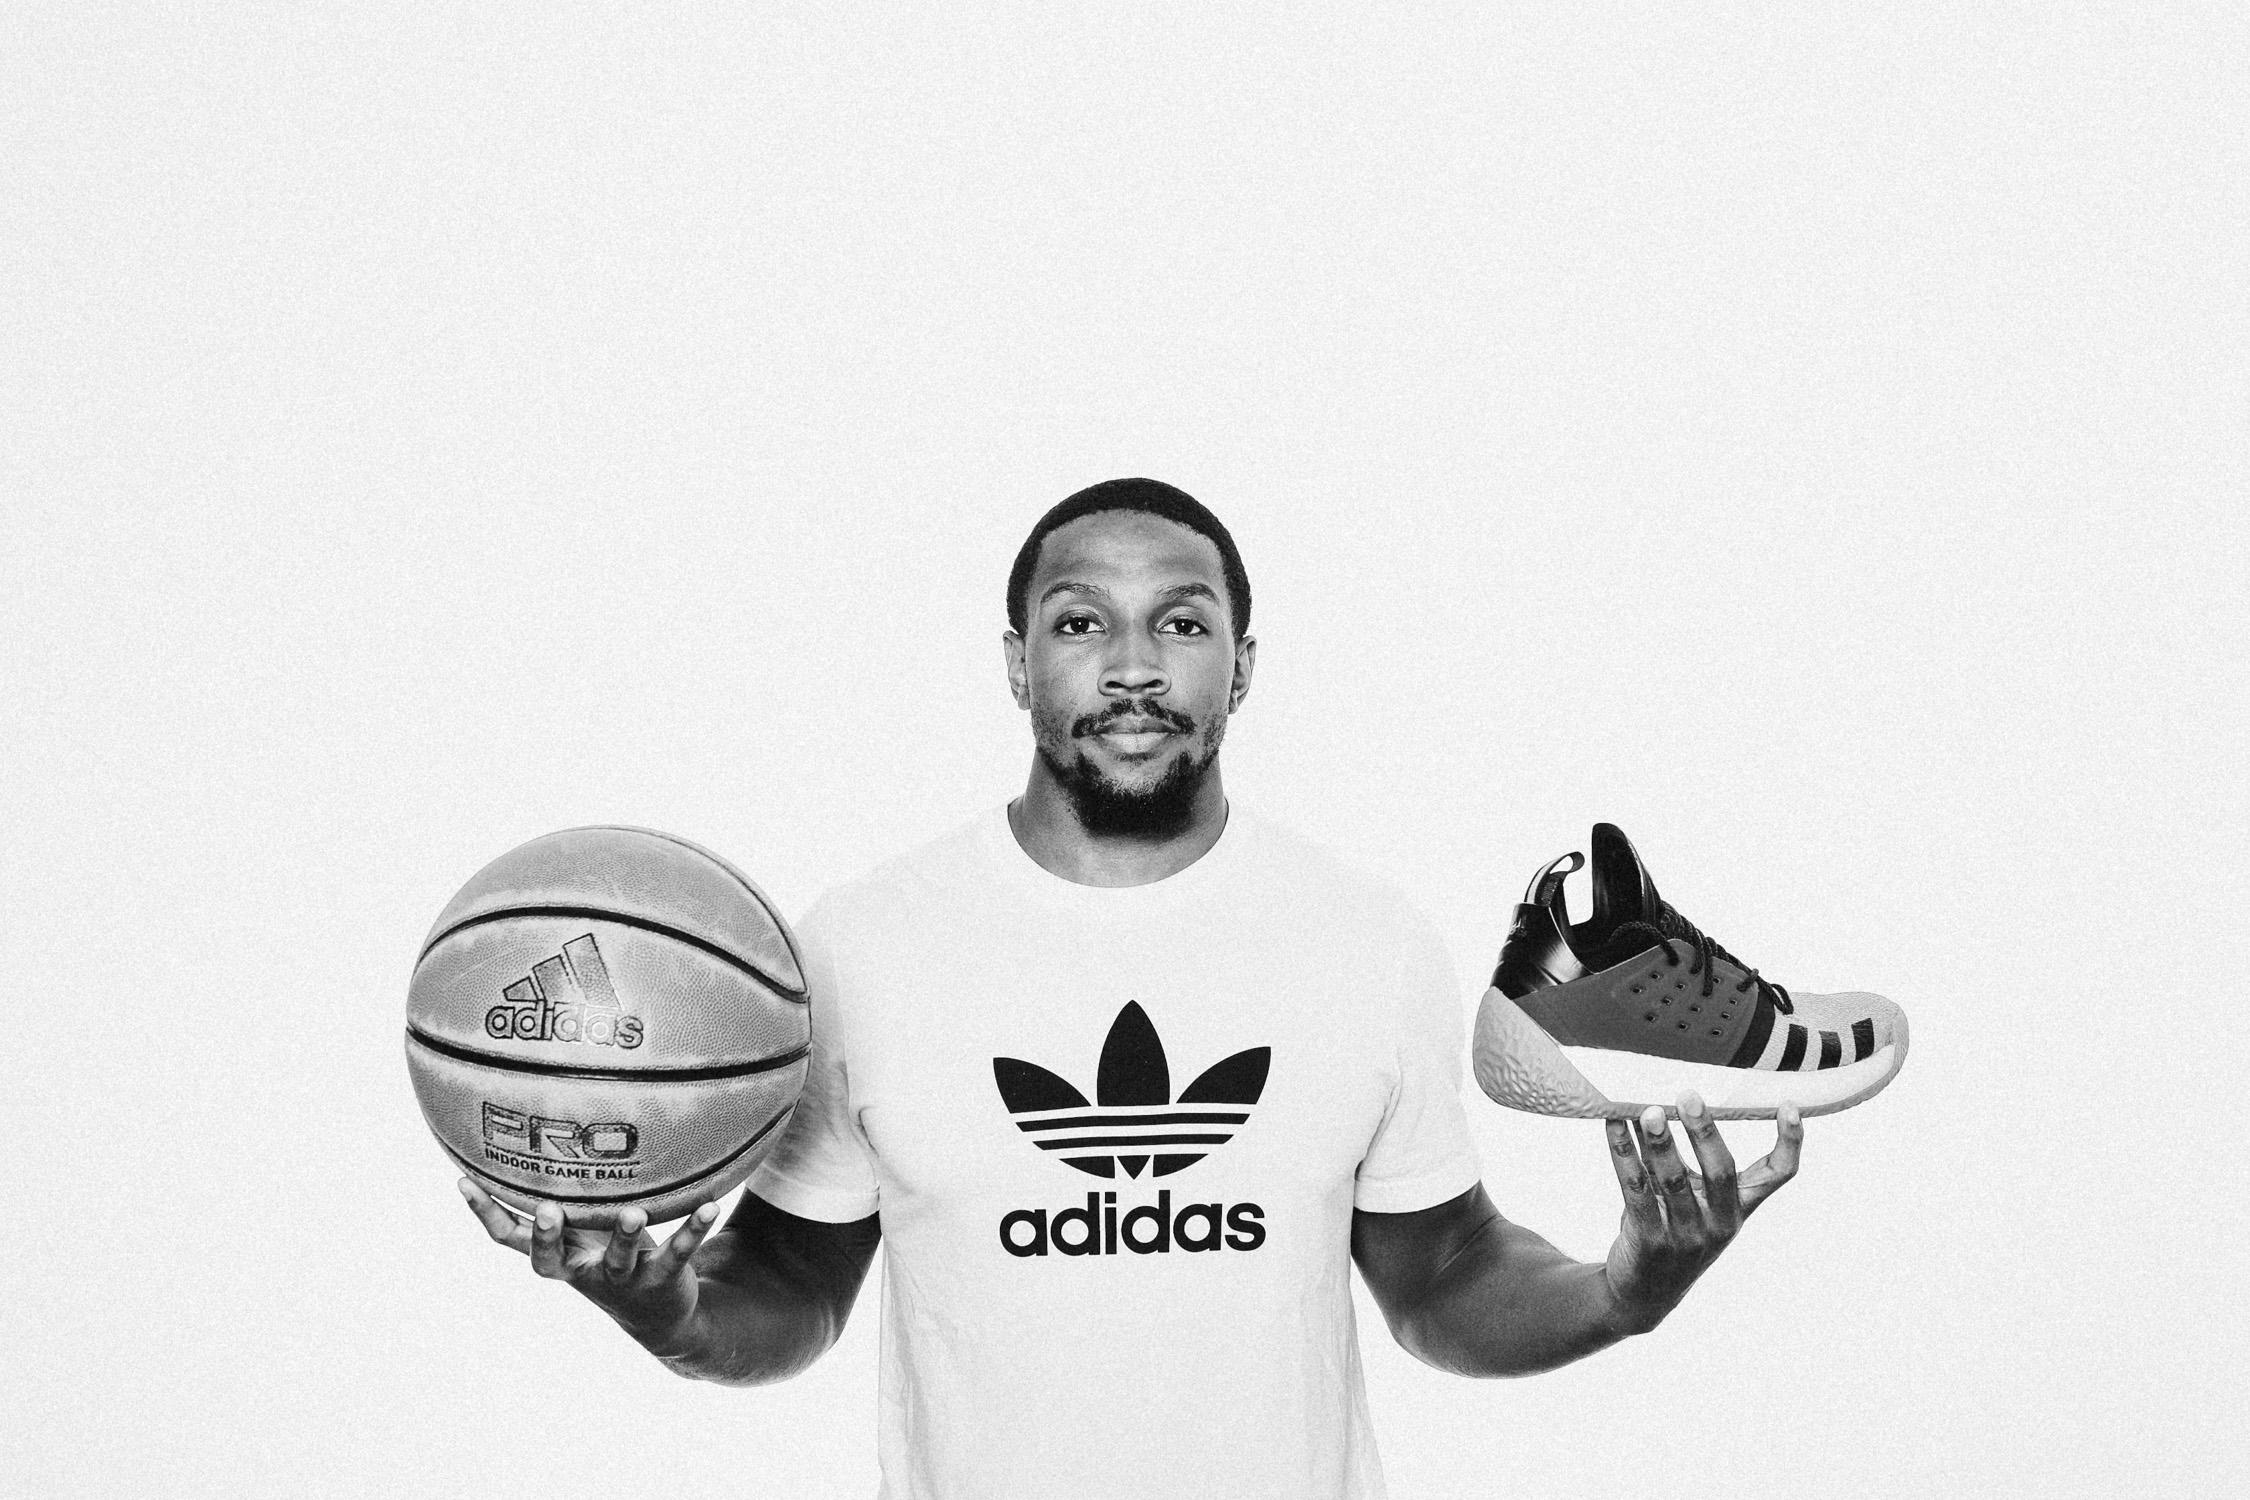 Adidas Portraits-6128.jpg